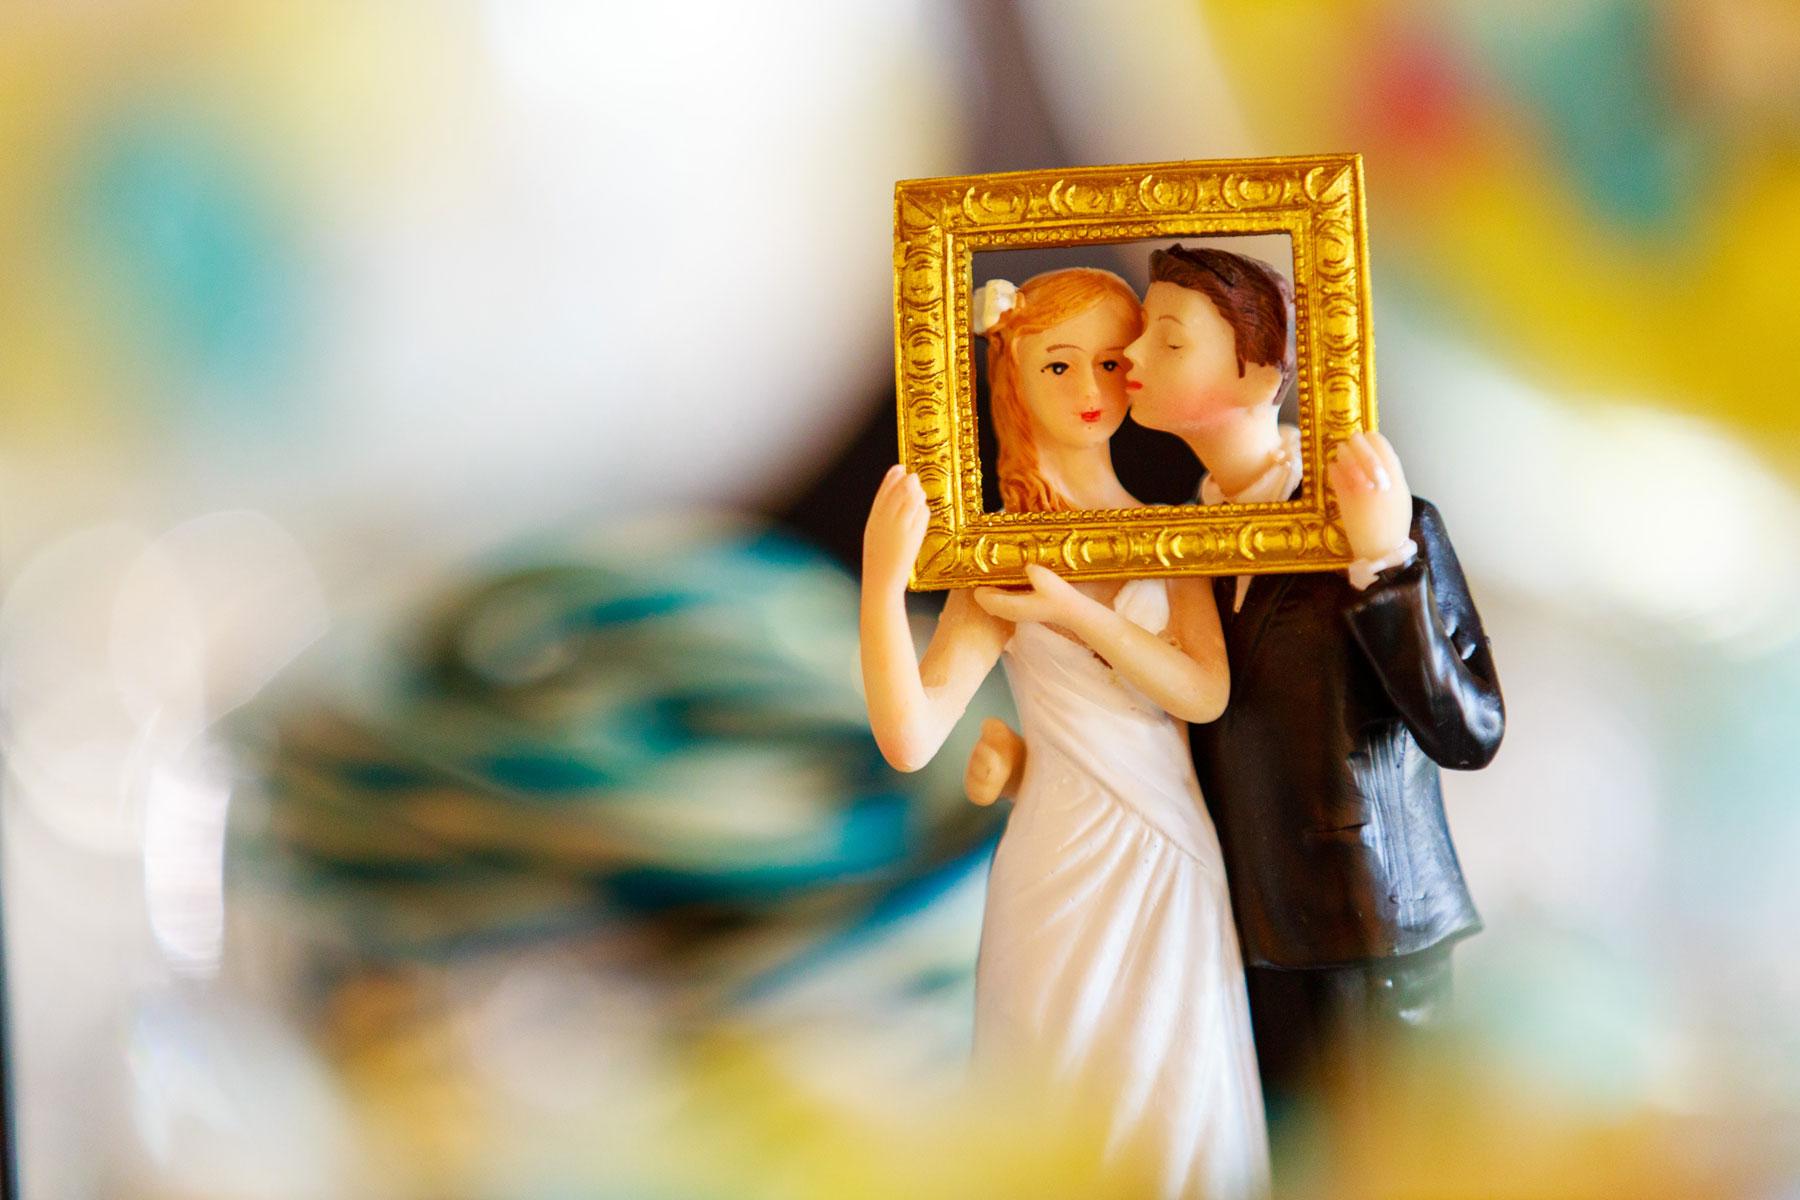 photographe de mariage à mesquer salle de l'artymes déco de table wedding cake